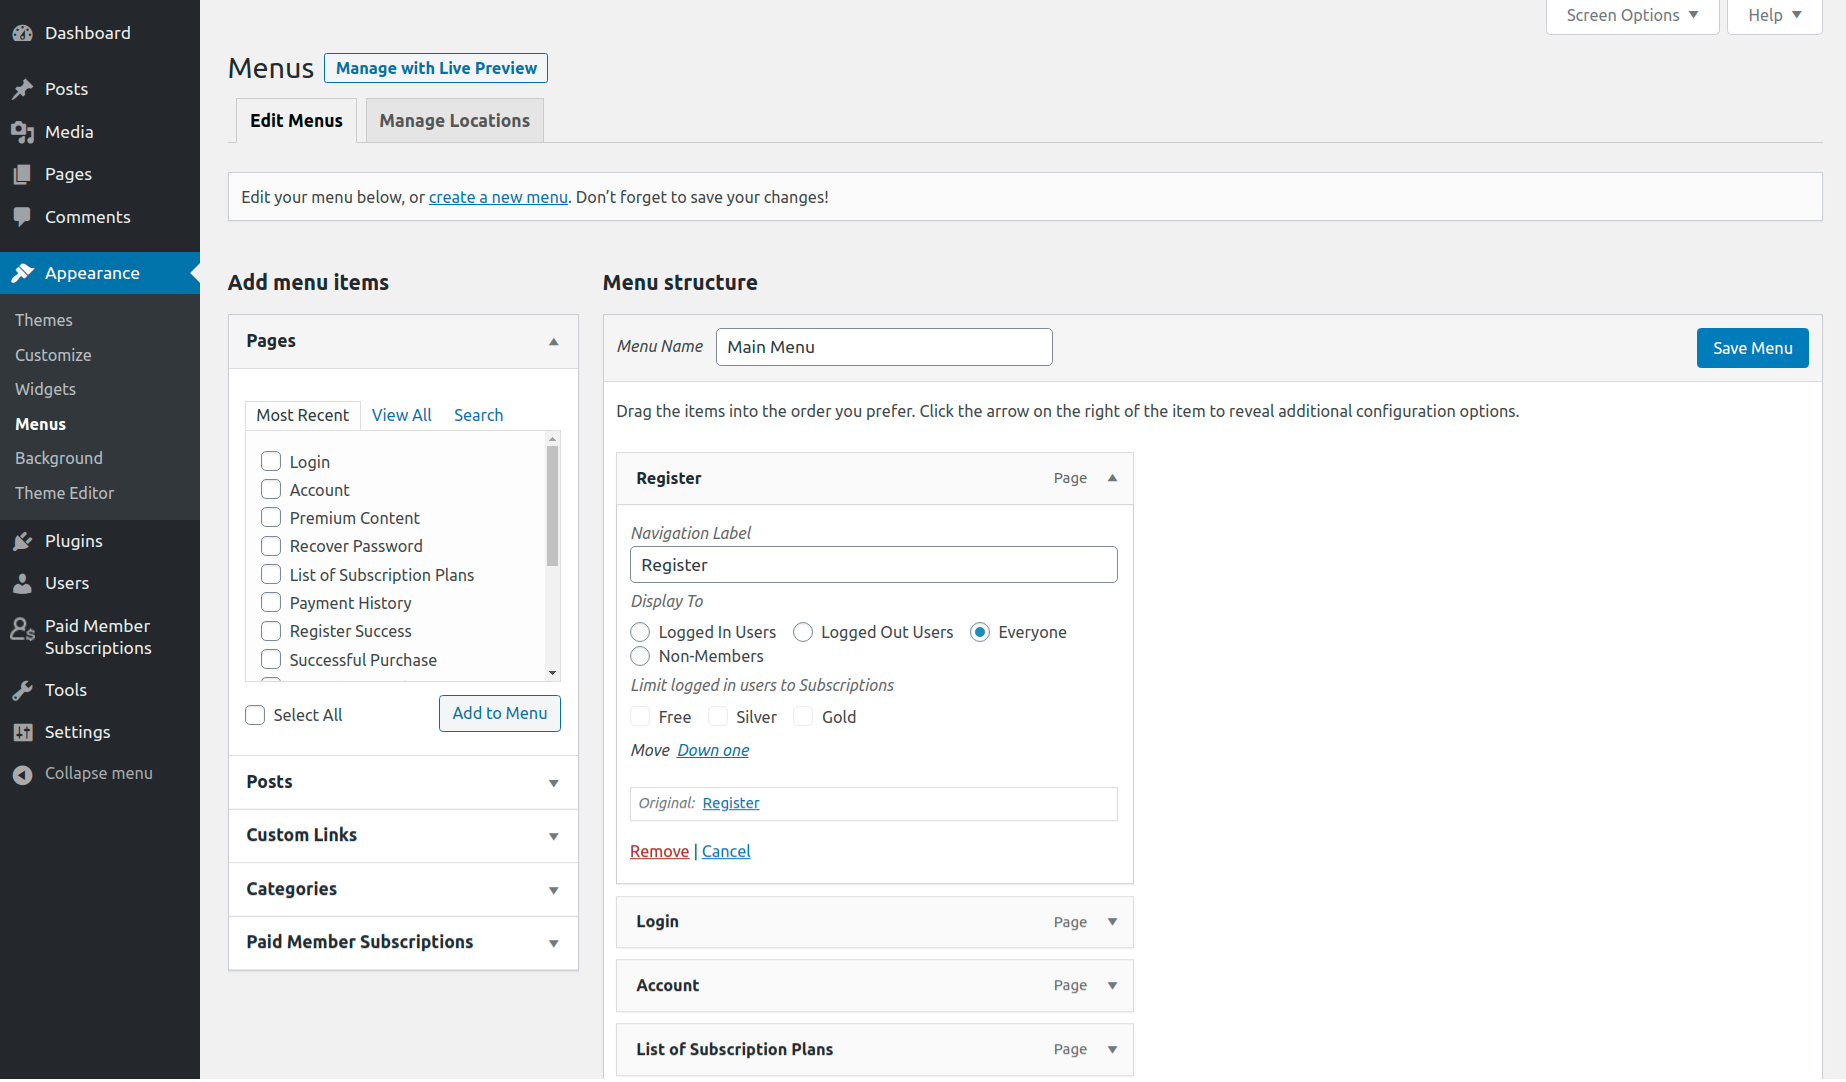 Paid Member Subscriptions Pro - Navigation Menu Filtering - Menu Items